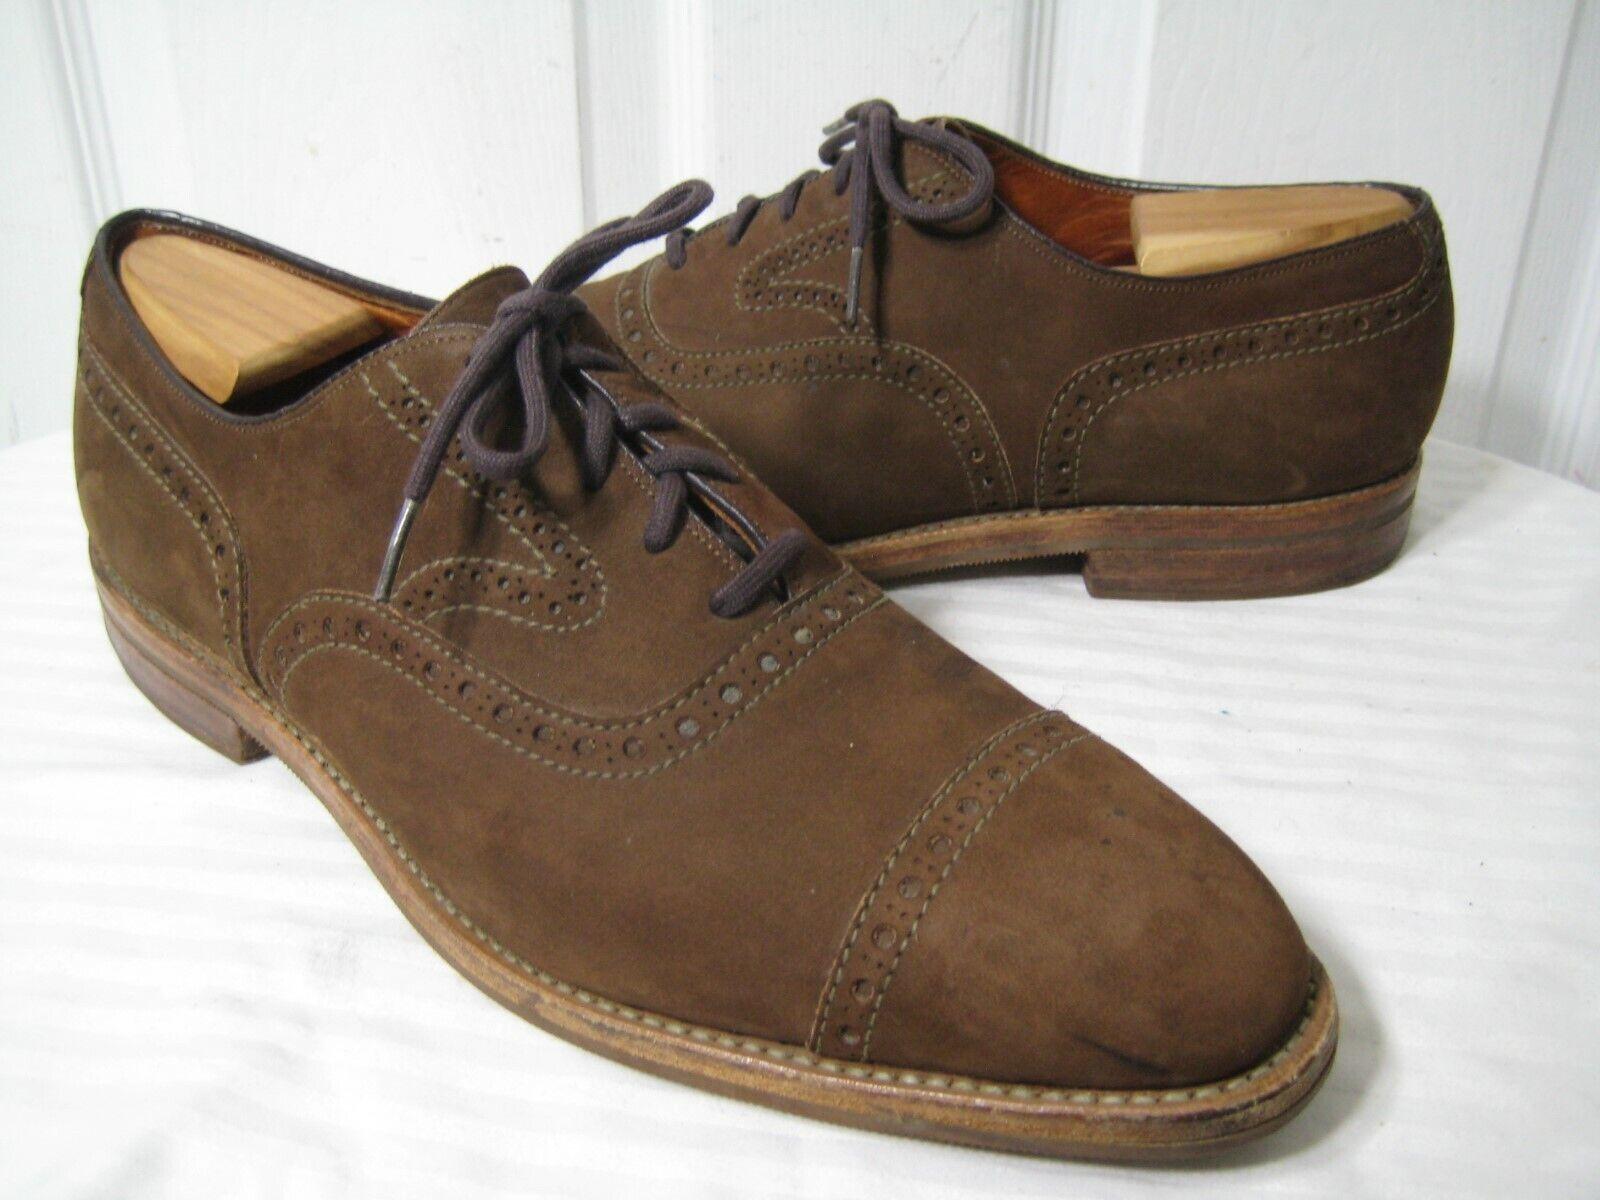 ASICS gamuza Hombre 12 Talla de calzado de Hombres EE. UU